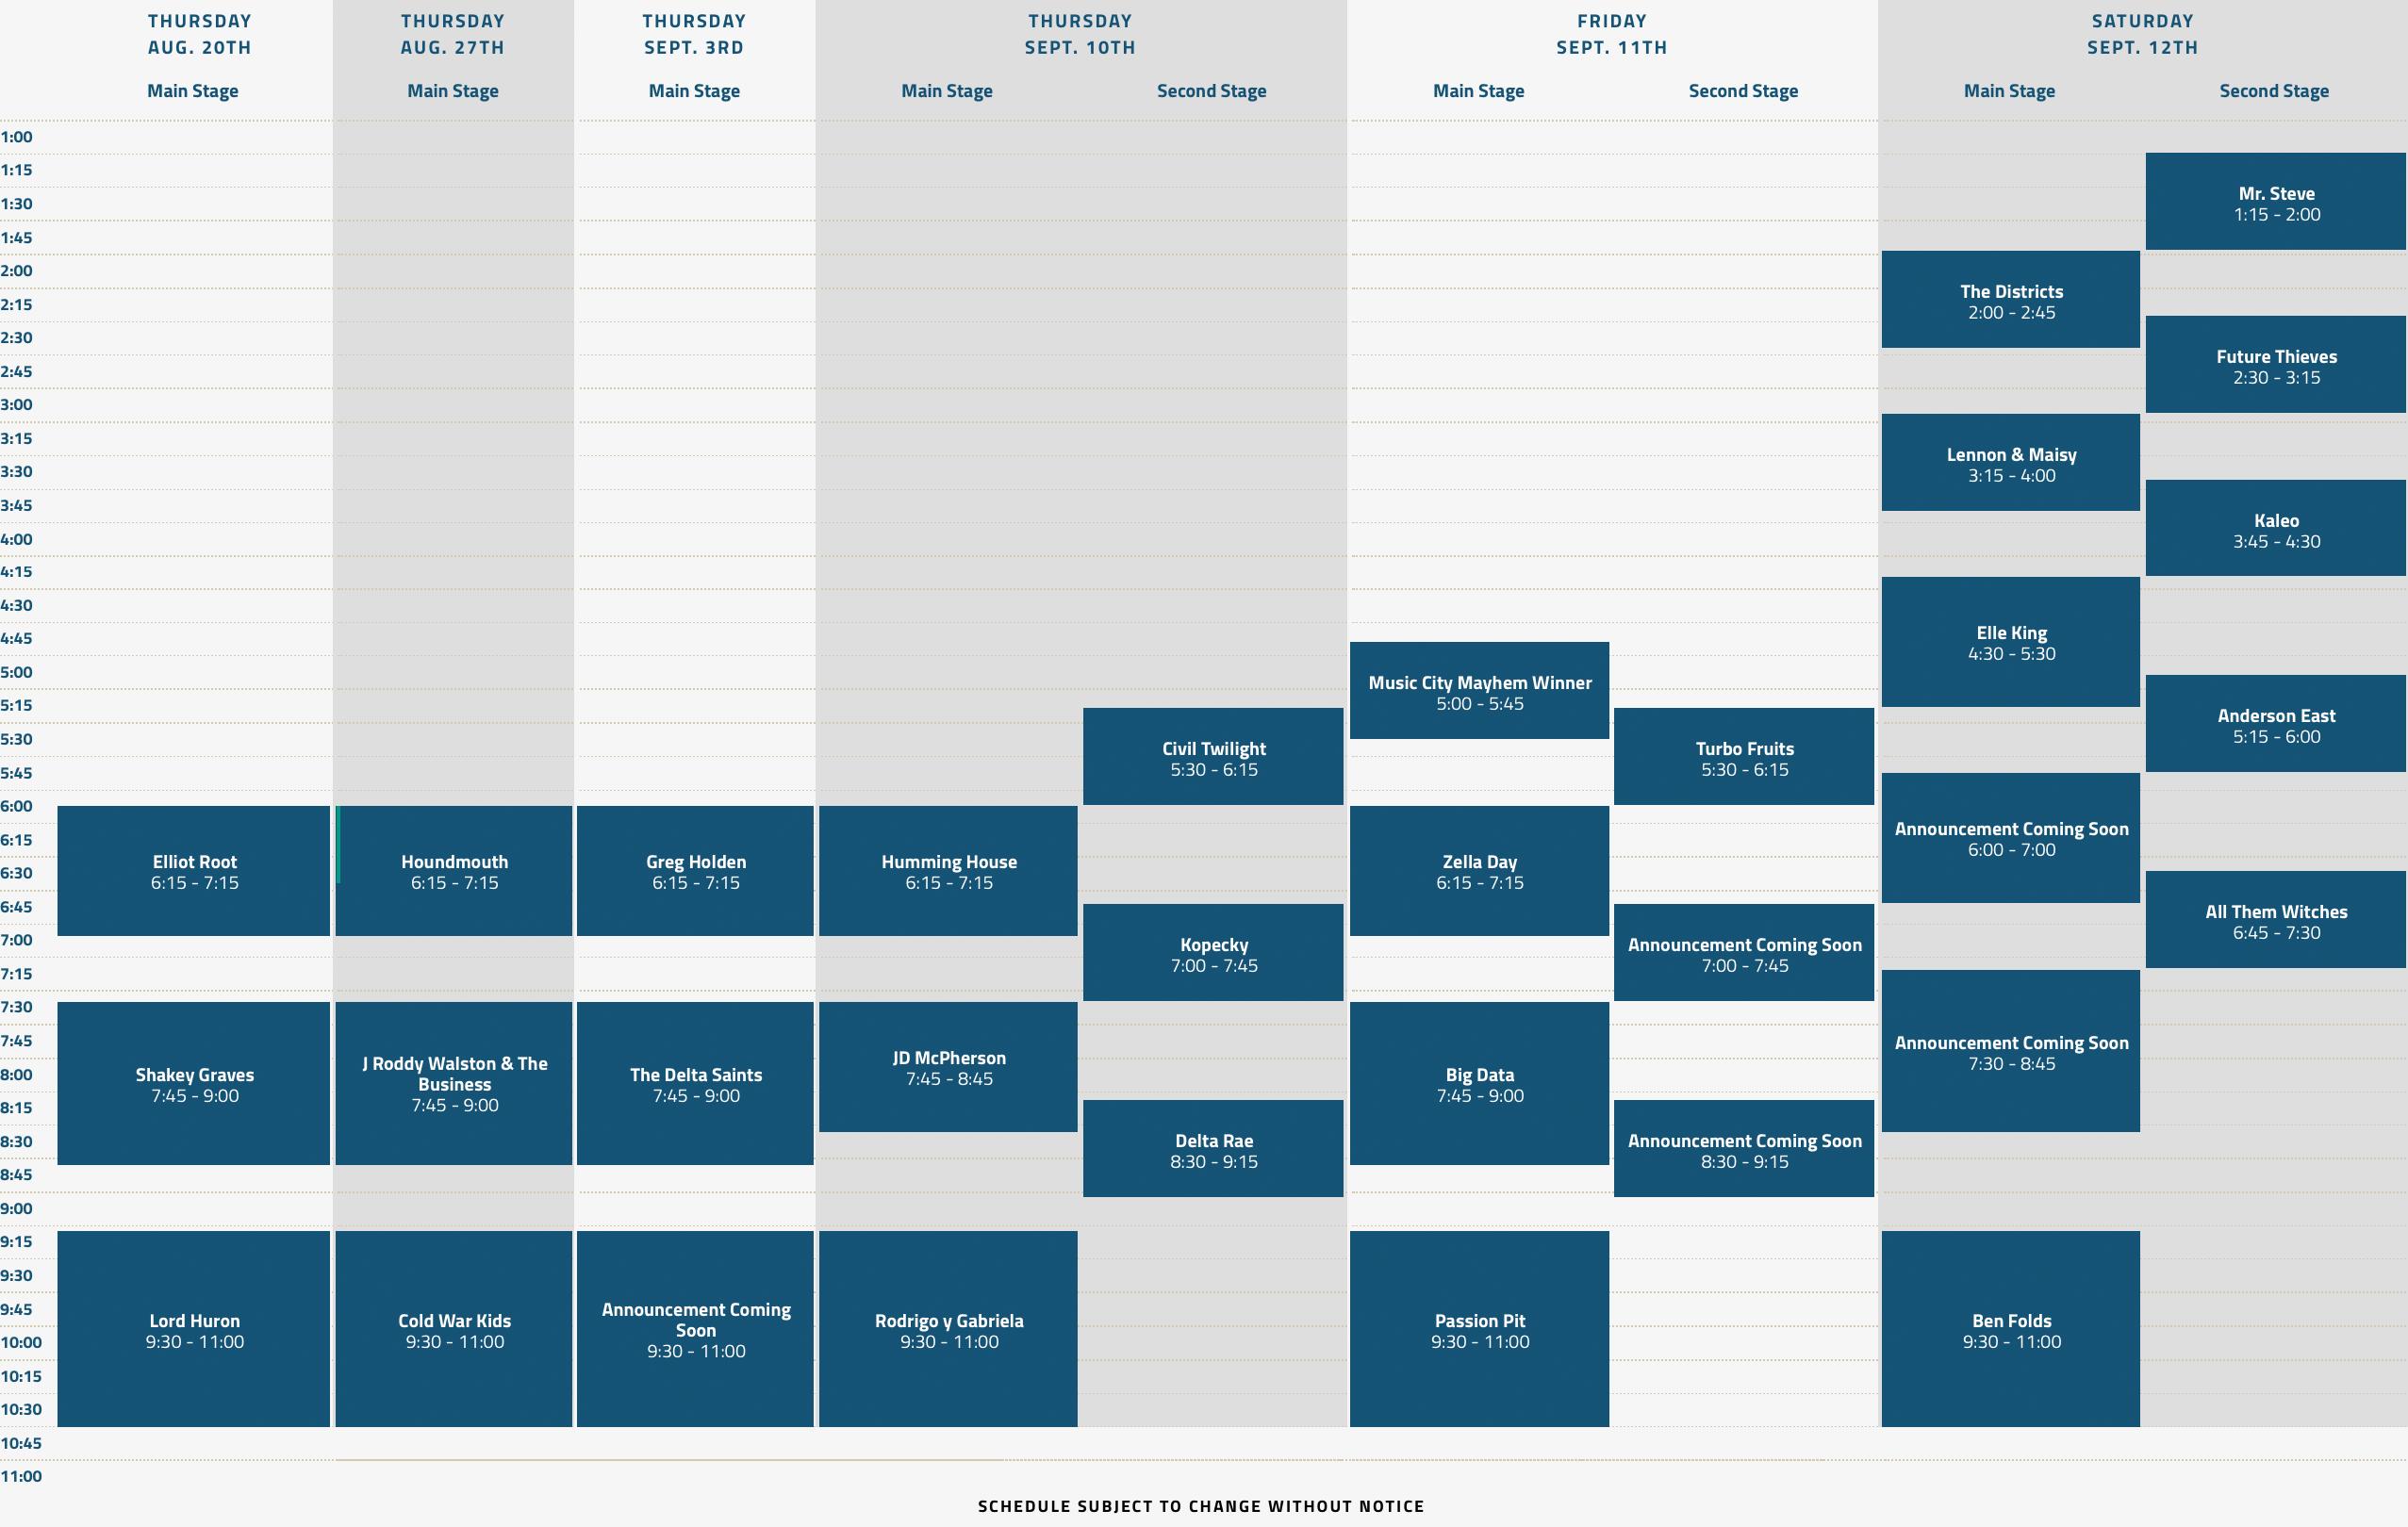 LOTG2015_Schedule